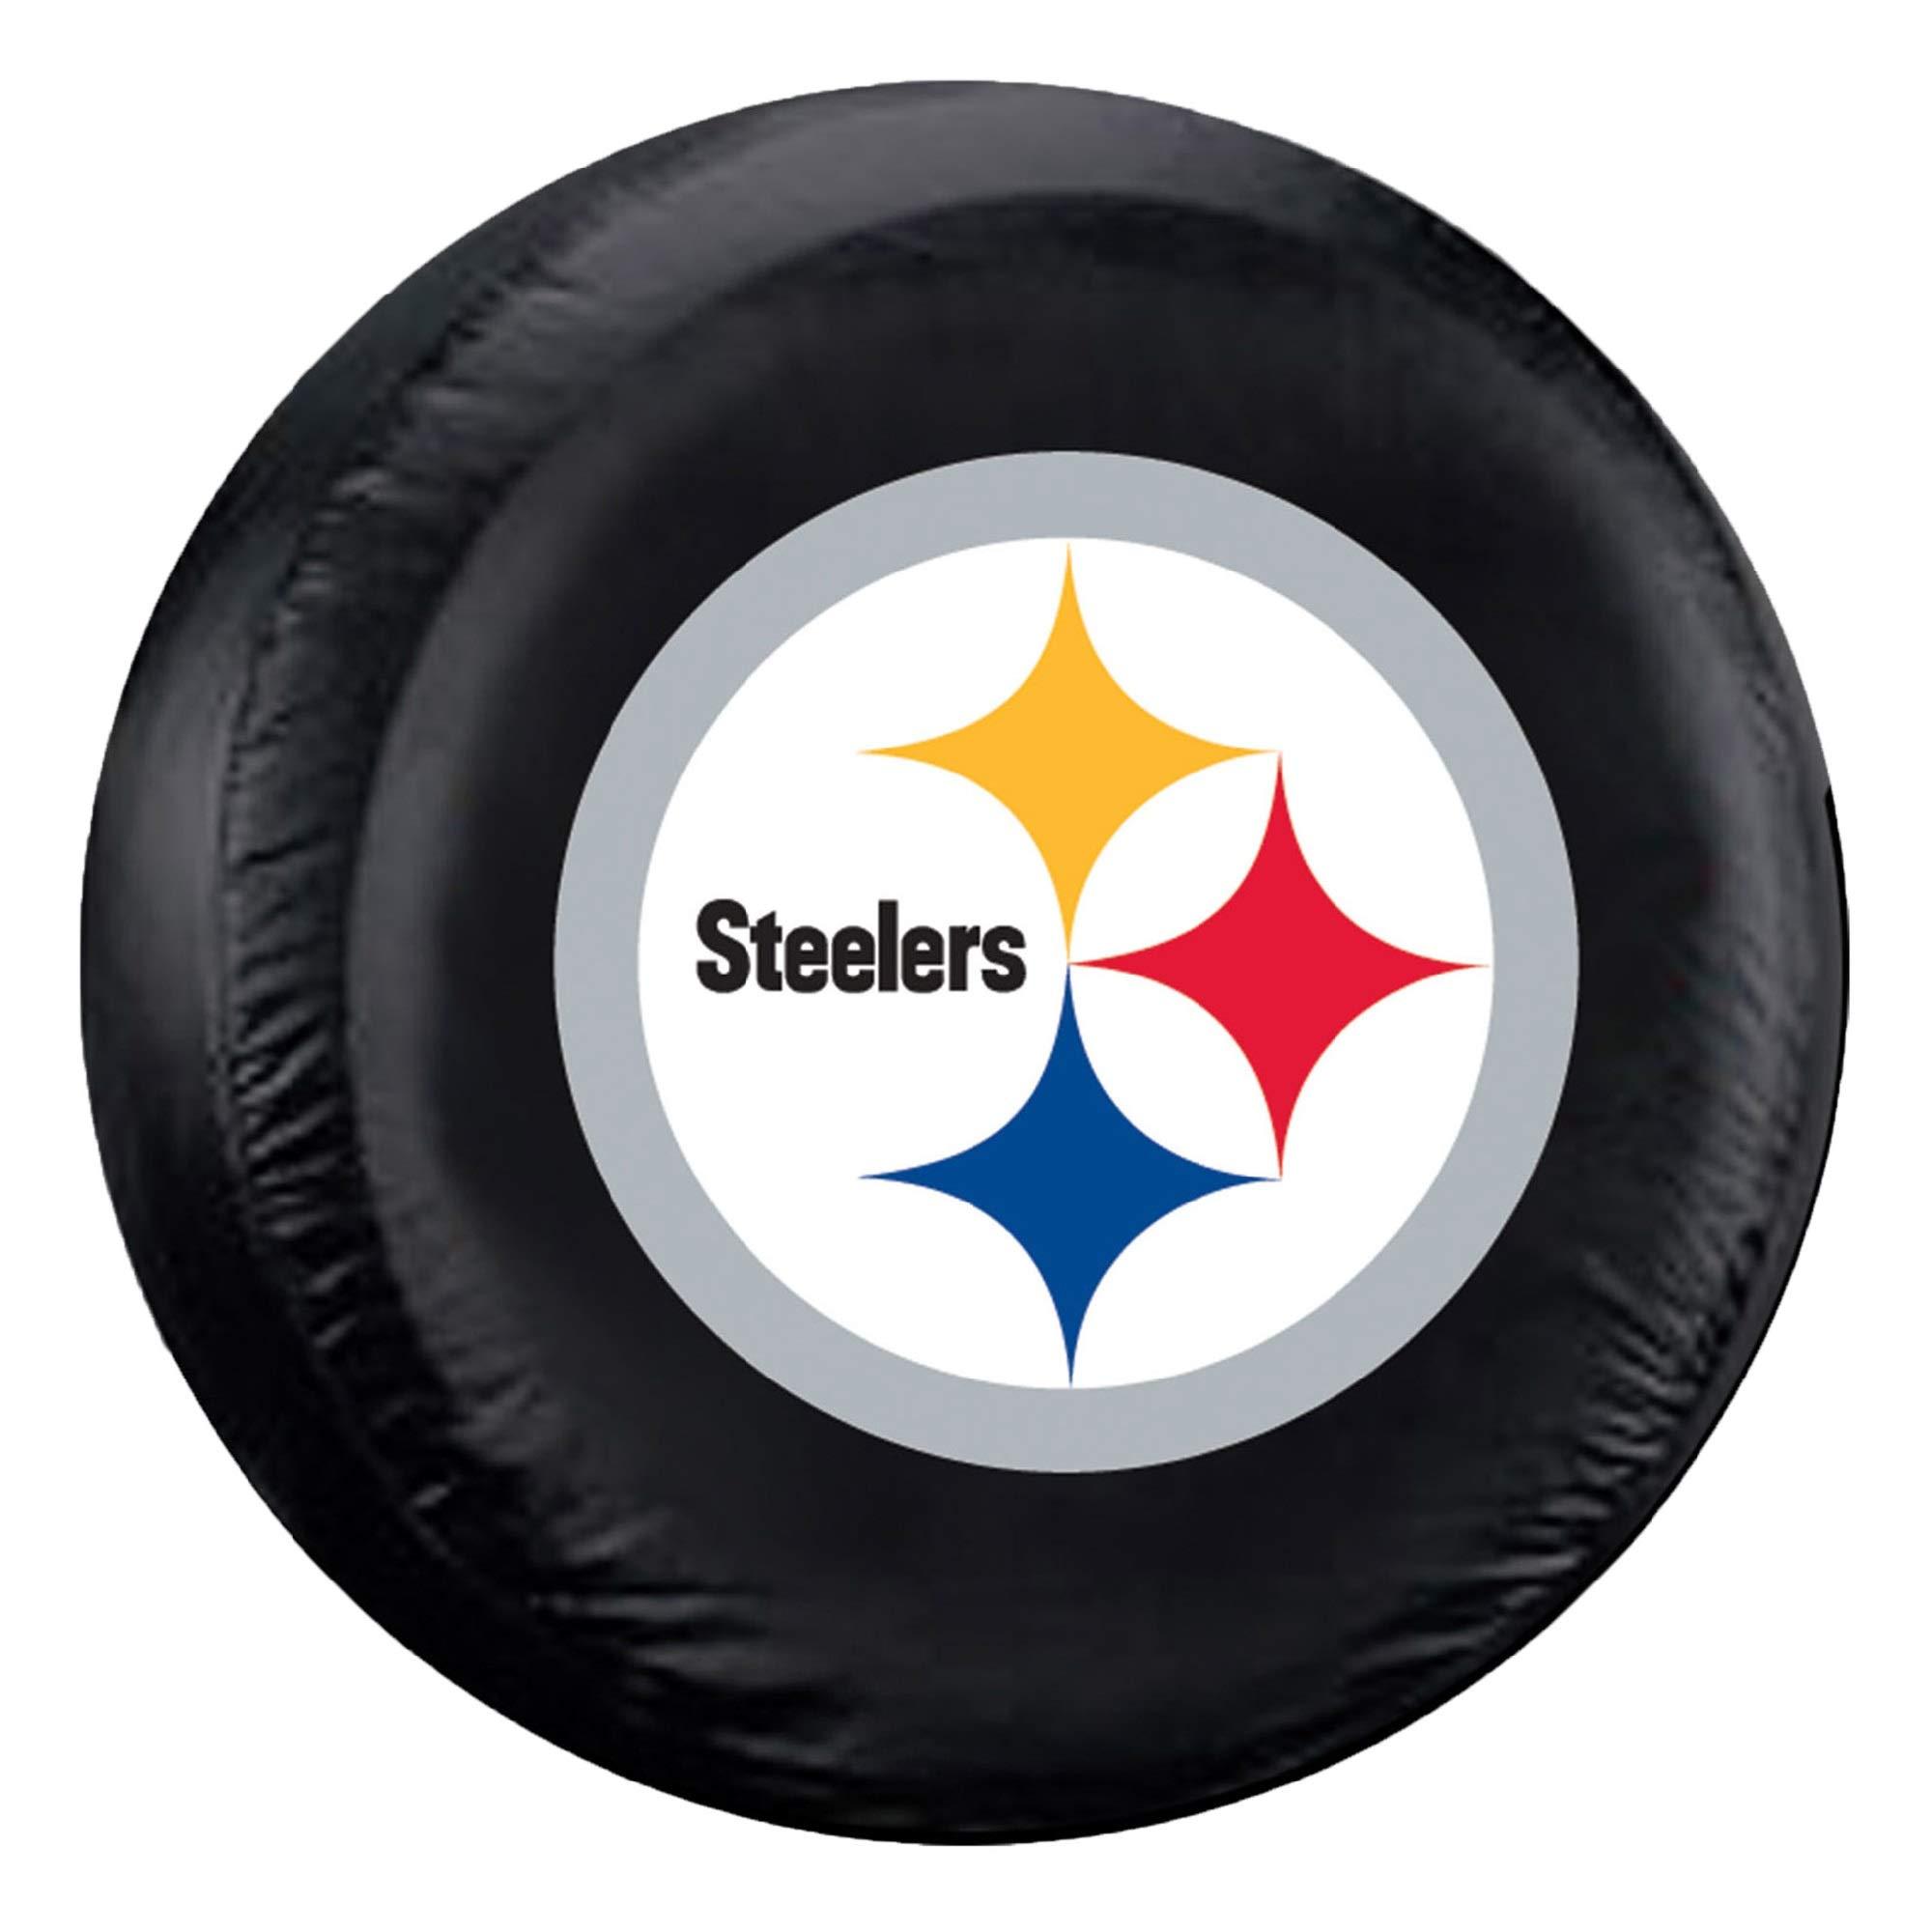 Fremont Die NFL Pittsburgh Steelers Tire Cover, Standard Size (27-29'' Diameter) by Fremont Die